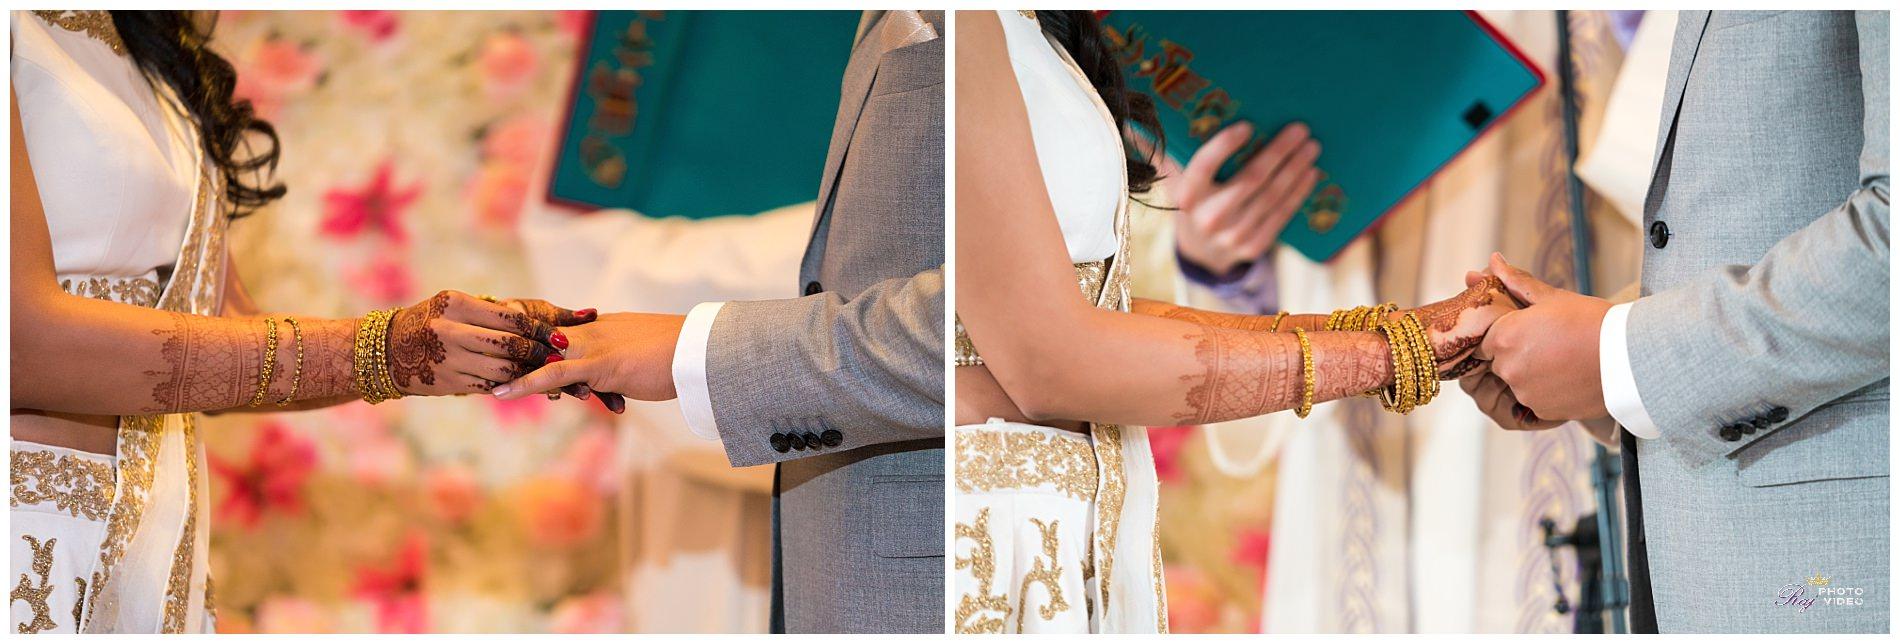 Royal-Manor-Garfield-NJ-Christian-Wedding-Ceremony-Khusbu-Jeff-51.jpg